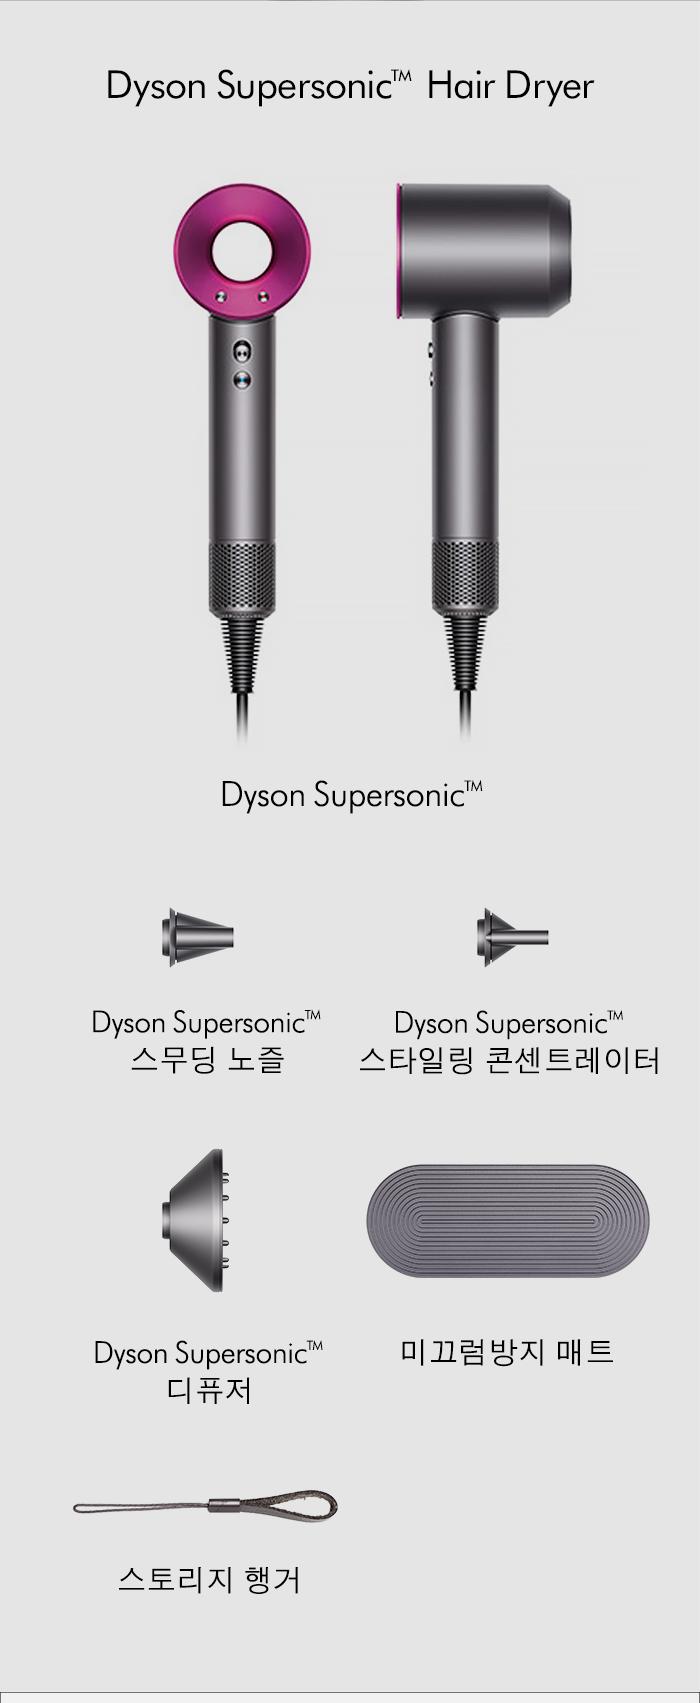 Dyson Supersonic TM Hair Dryer